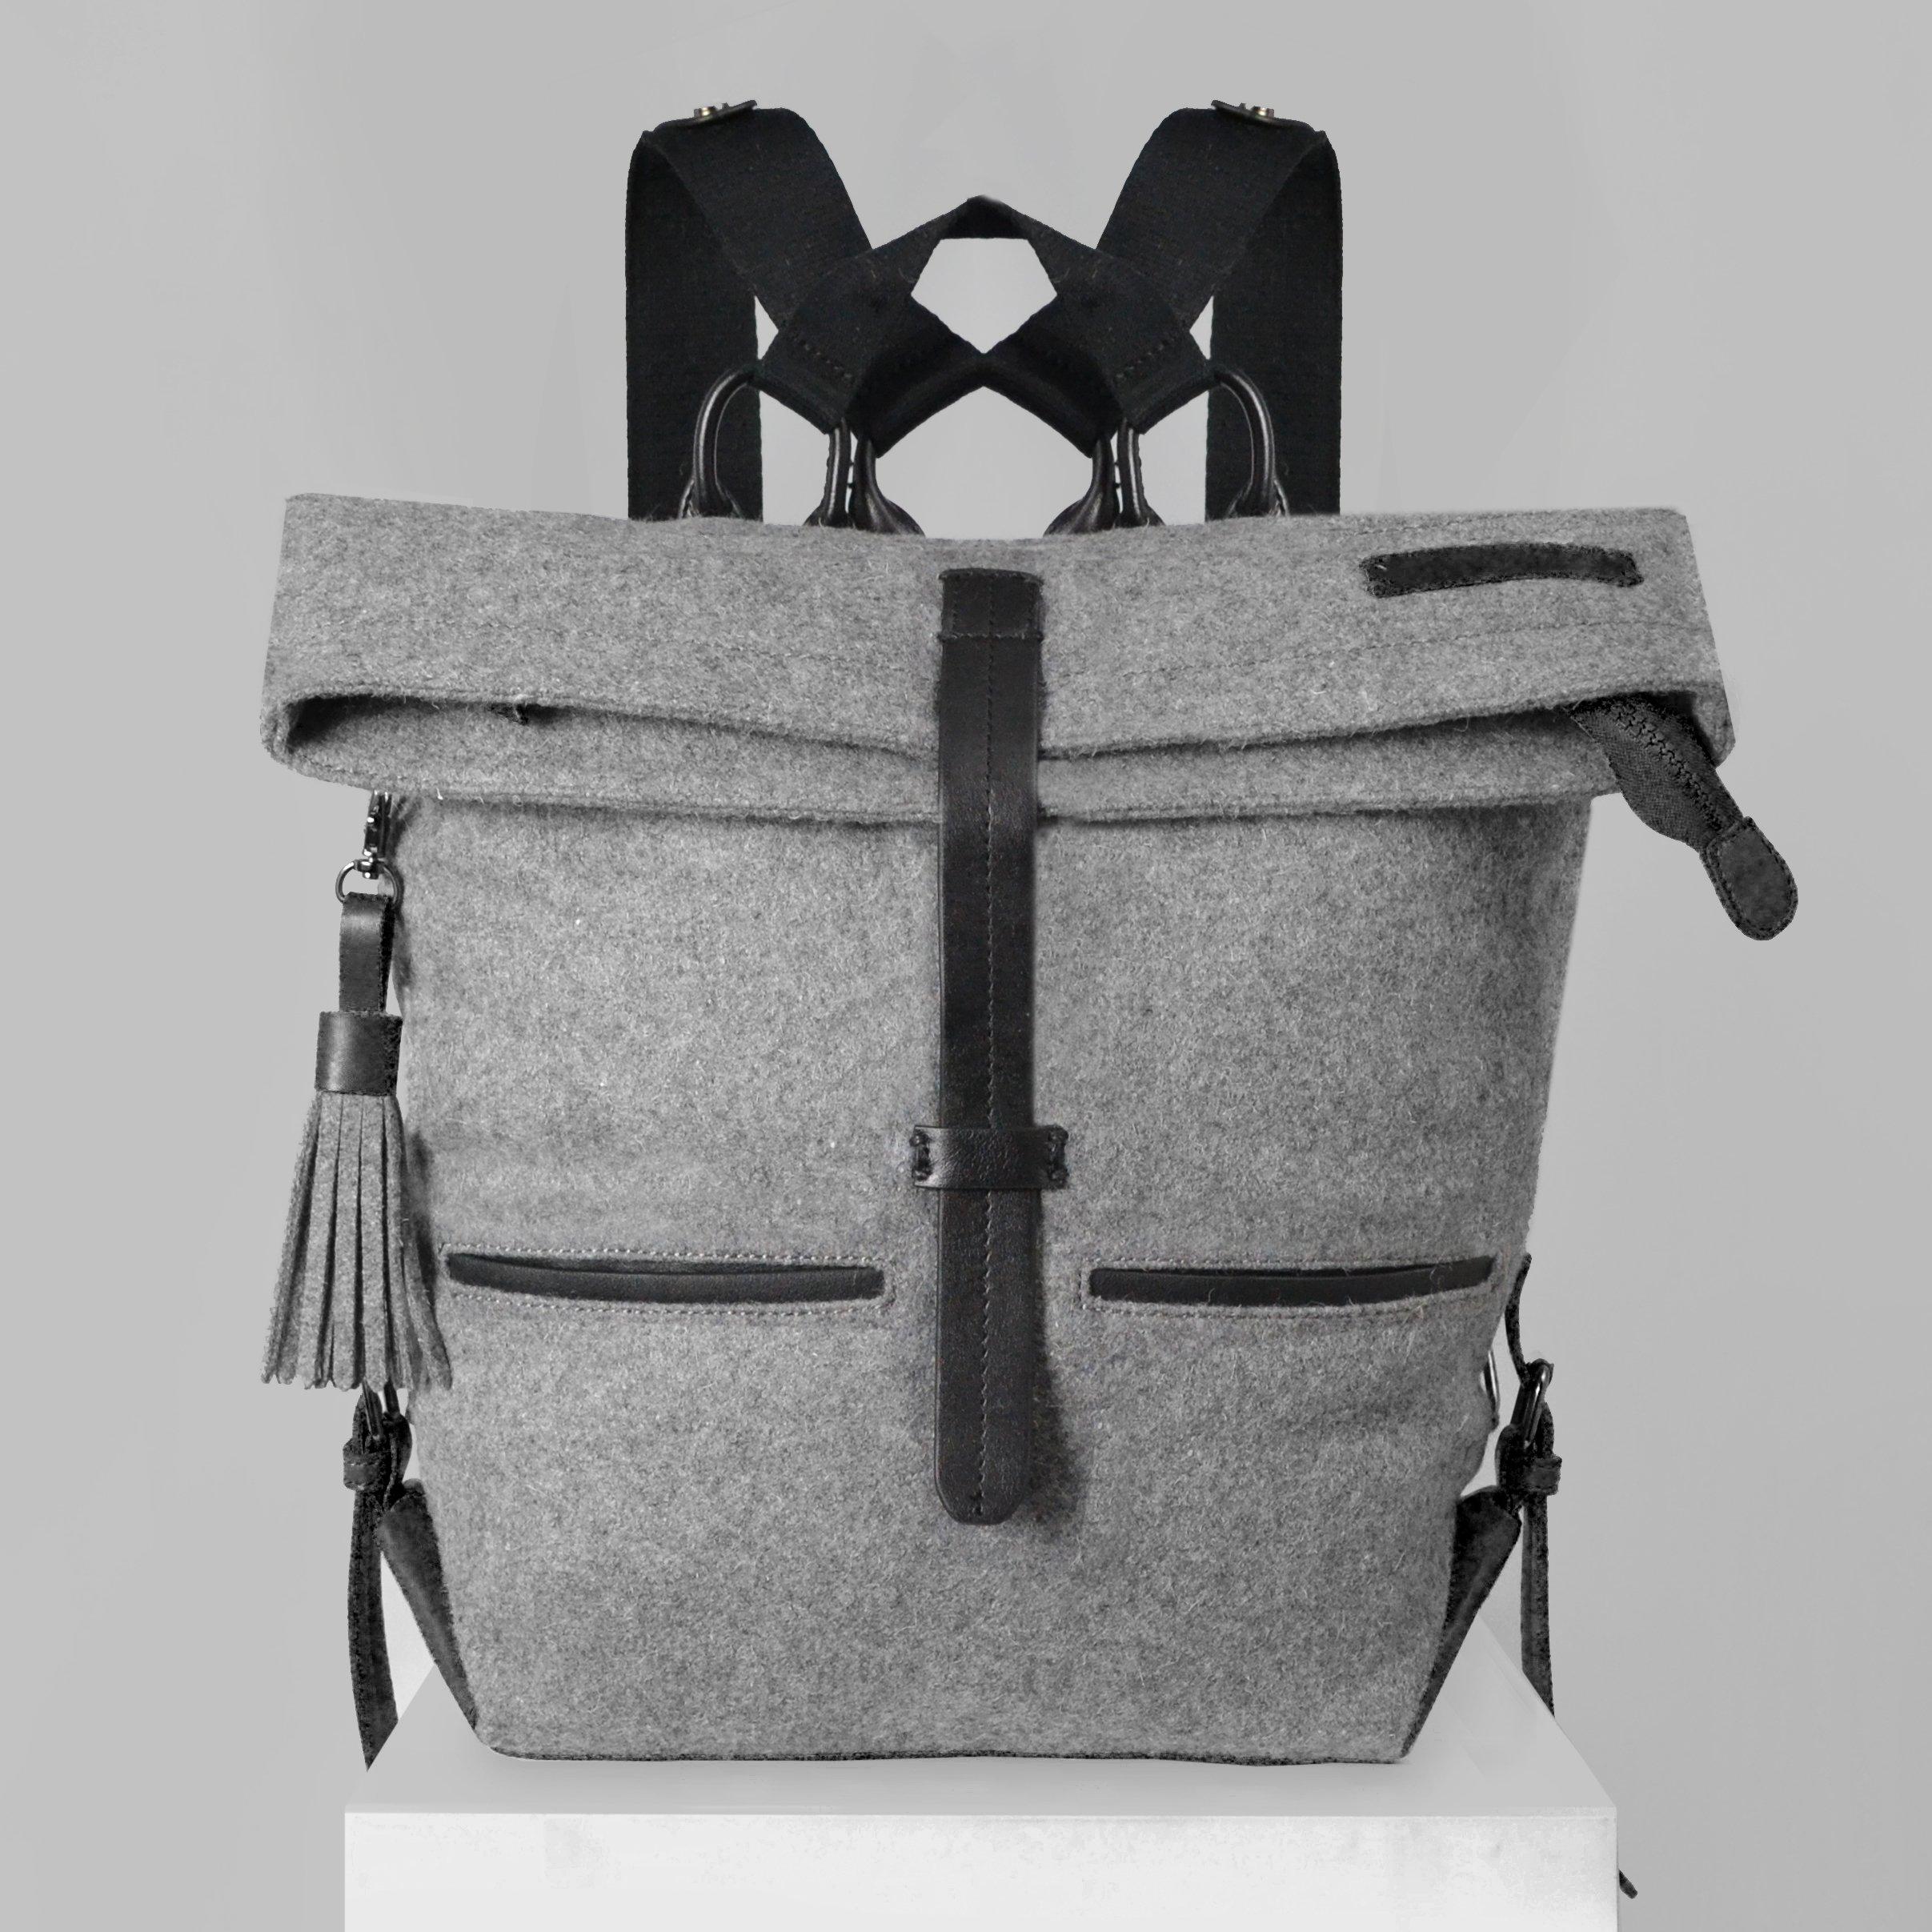 Sherpani Amelia Travel Backpack, One Size, Slate